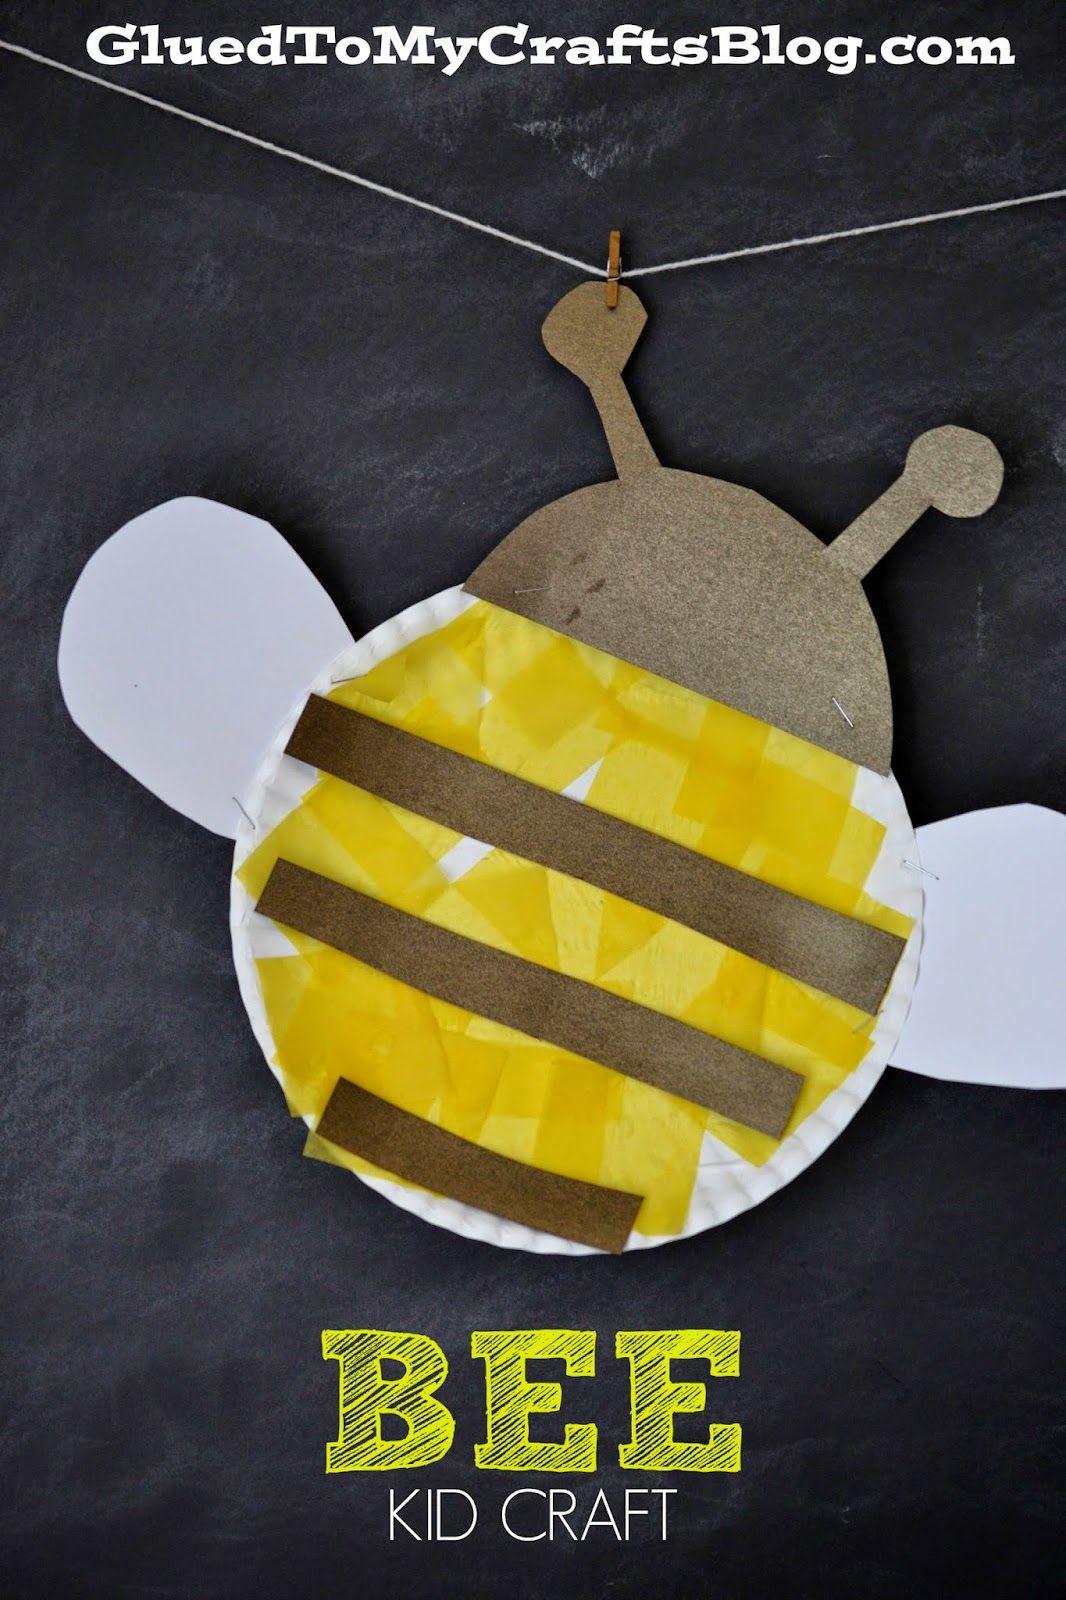 Honey Bee Kid Craft